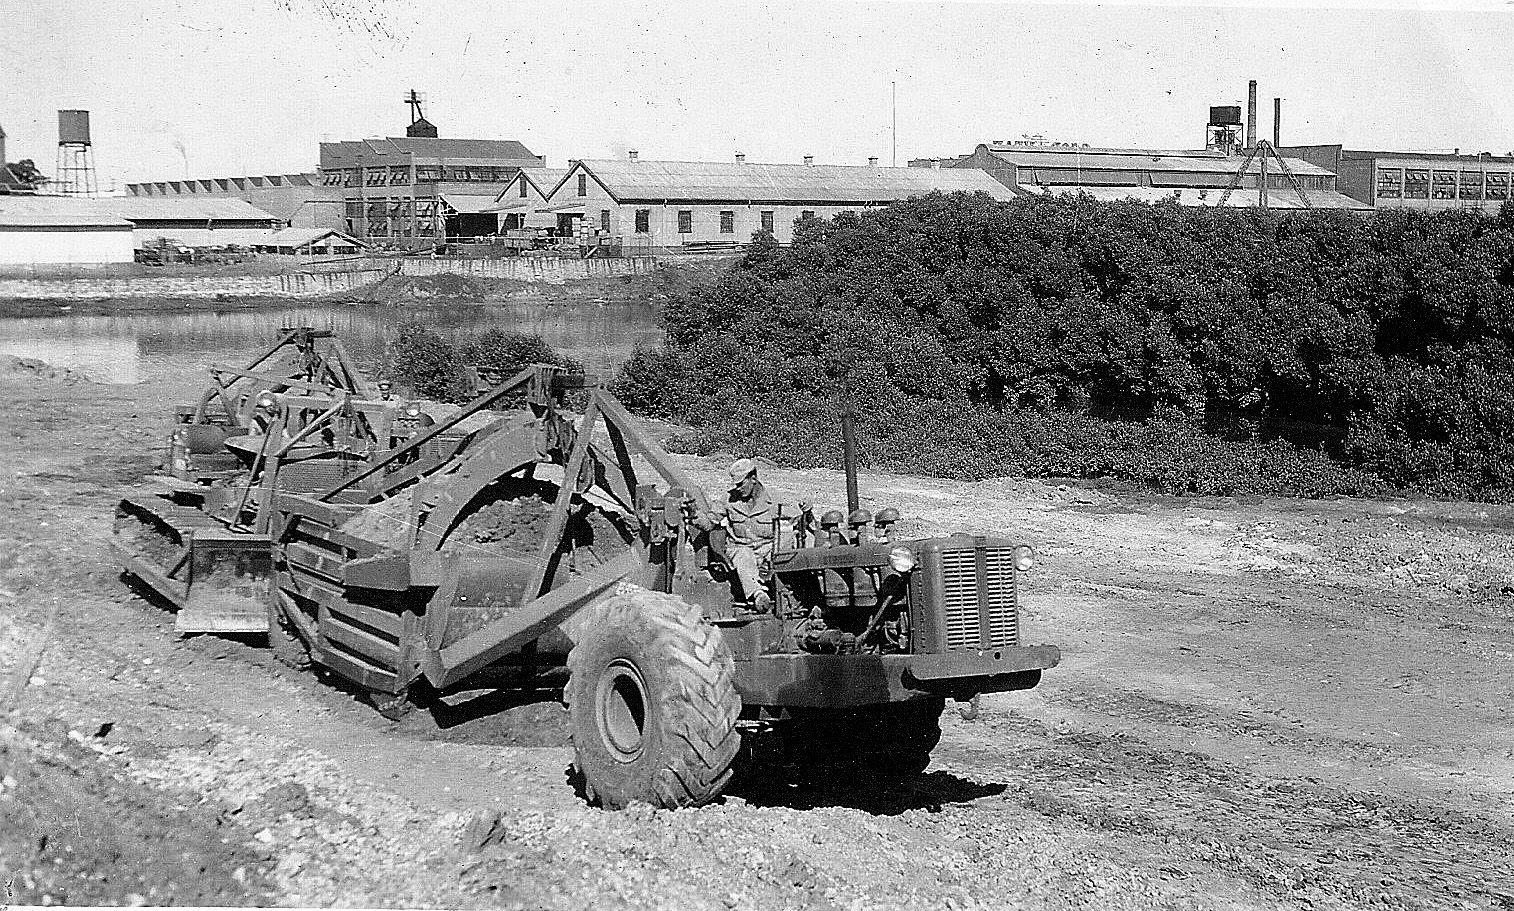 Classic Machines: LeTourneau's Model C Tournapull scraper